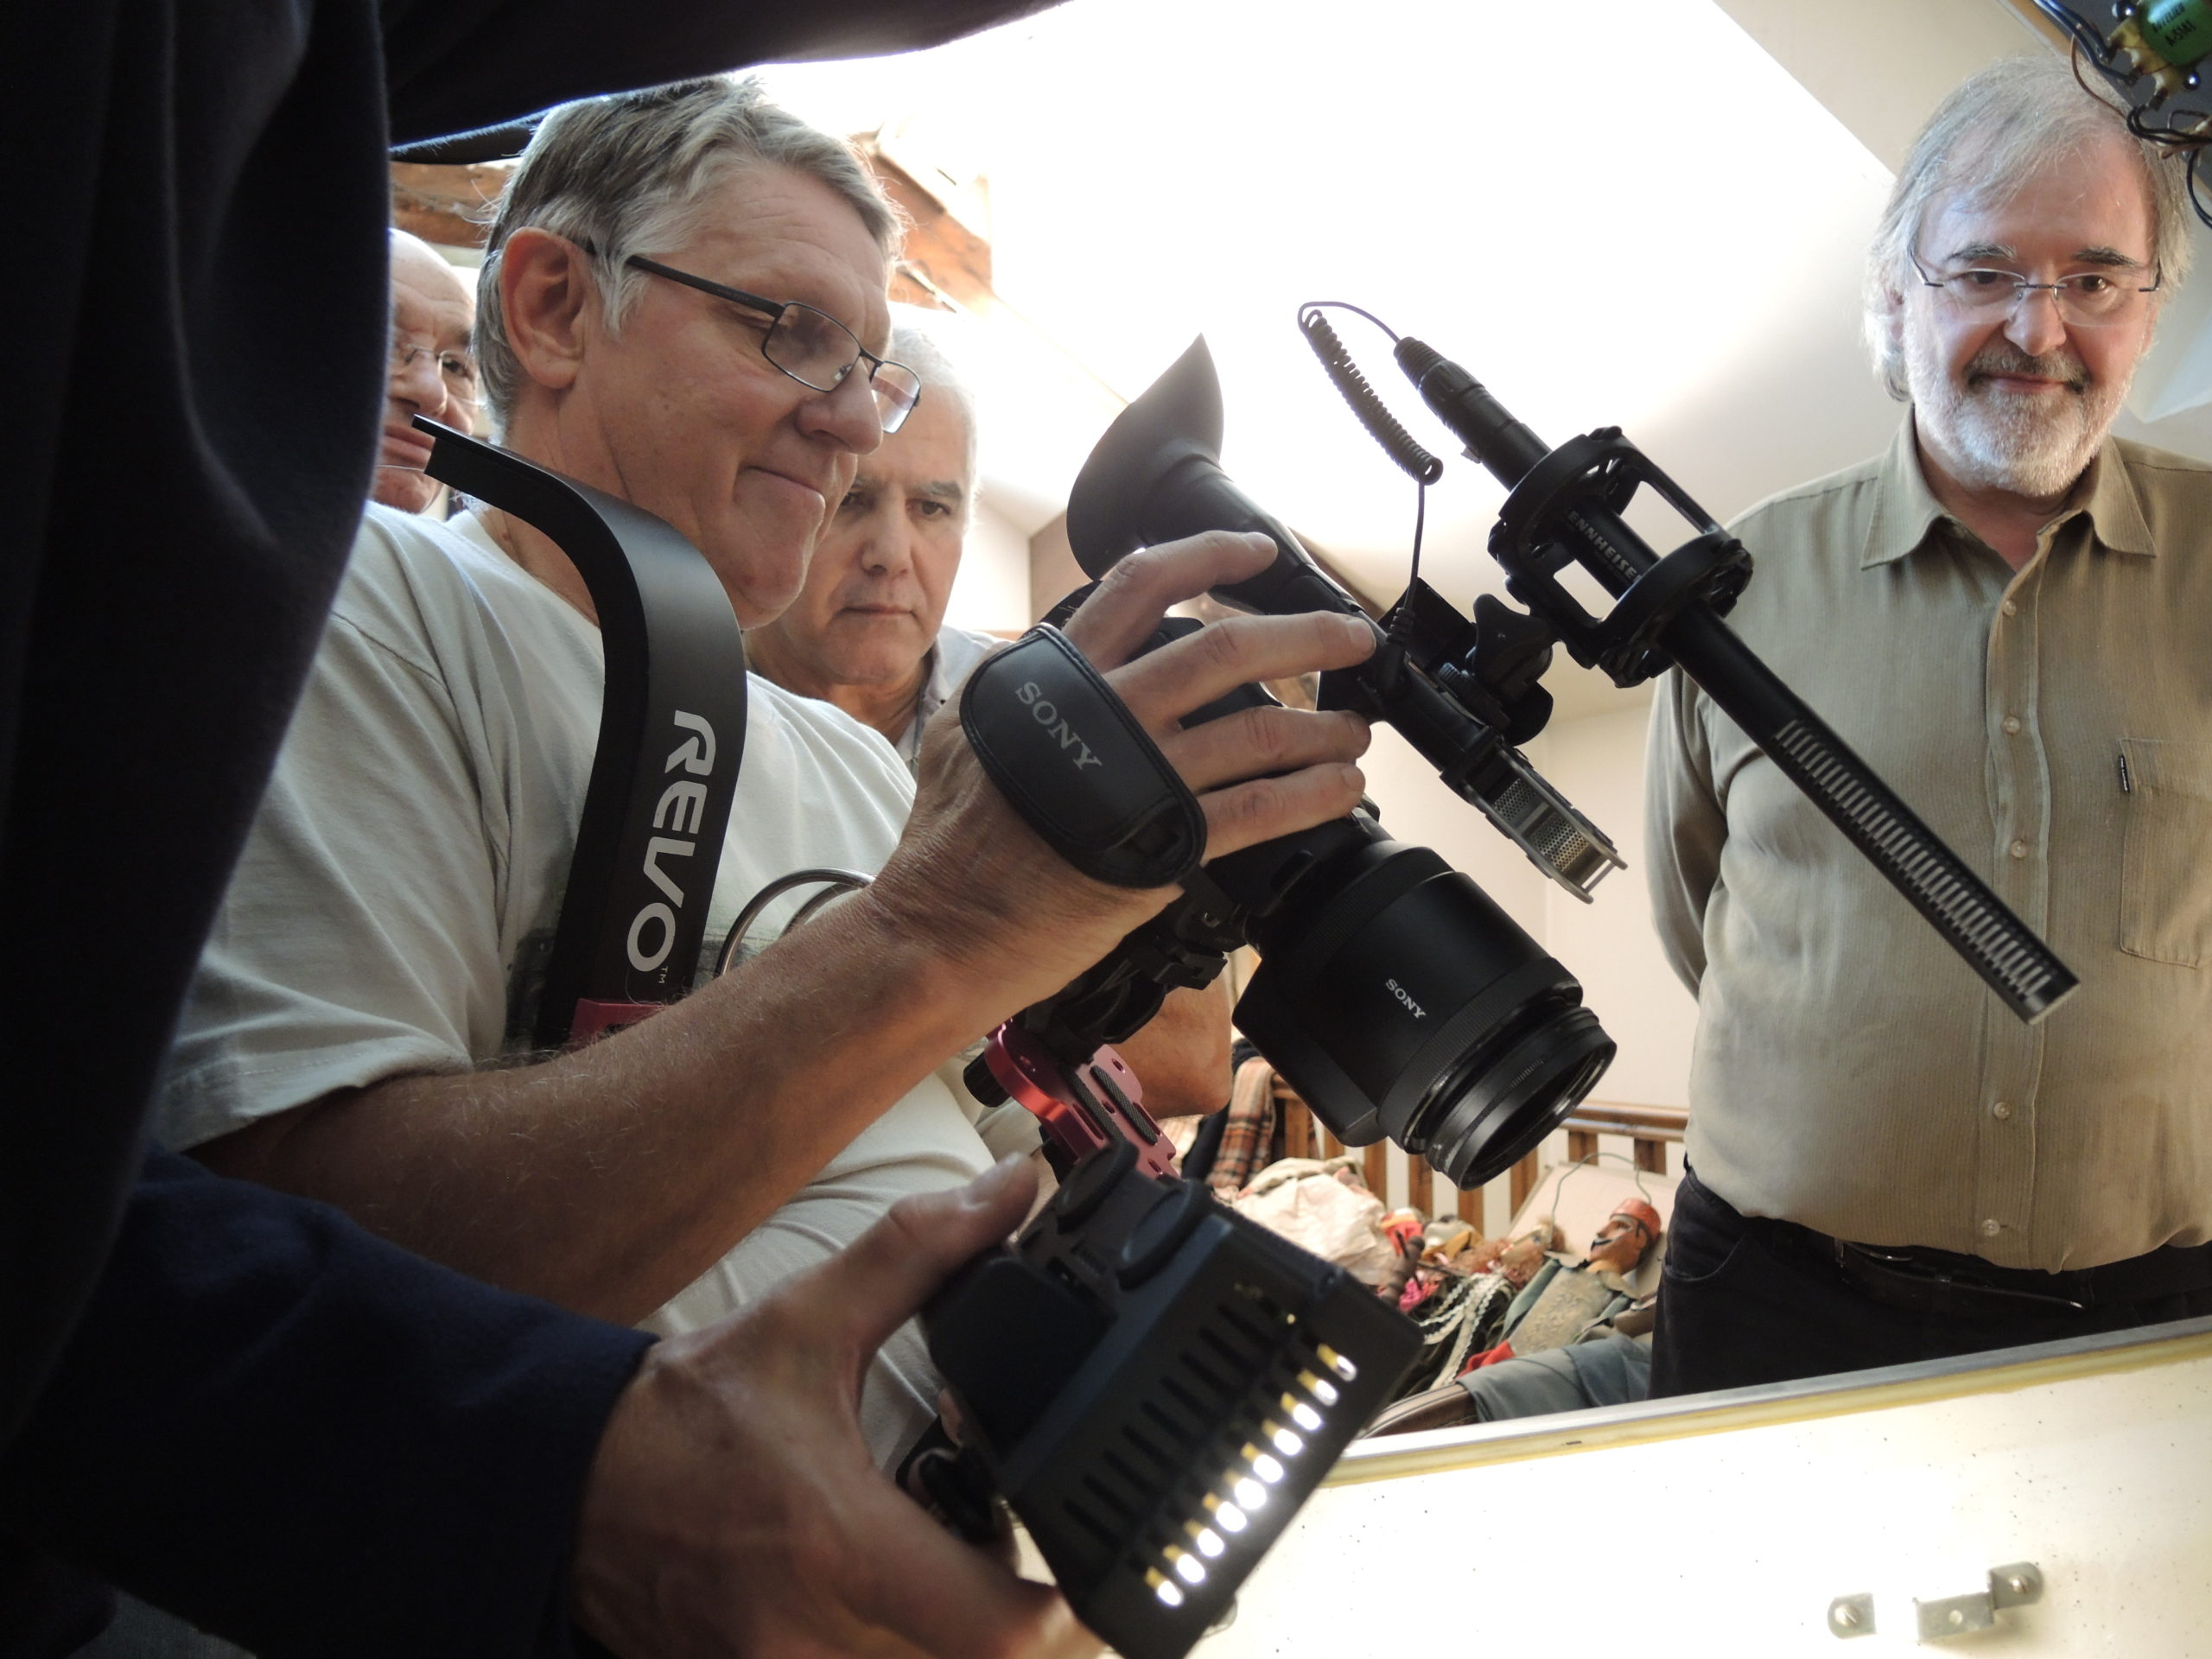 Game over photos tournage 40